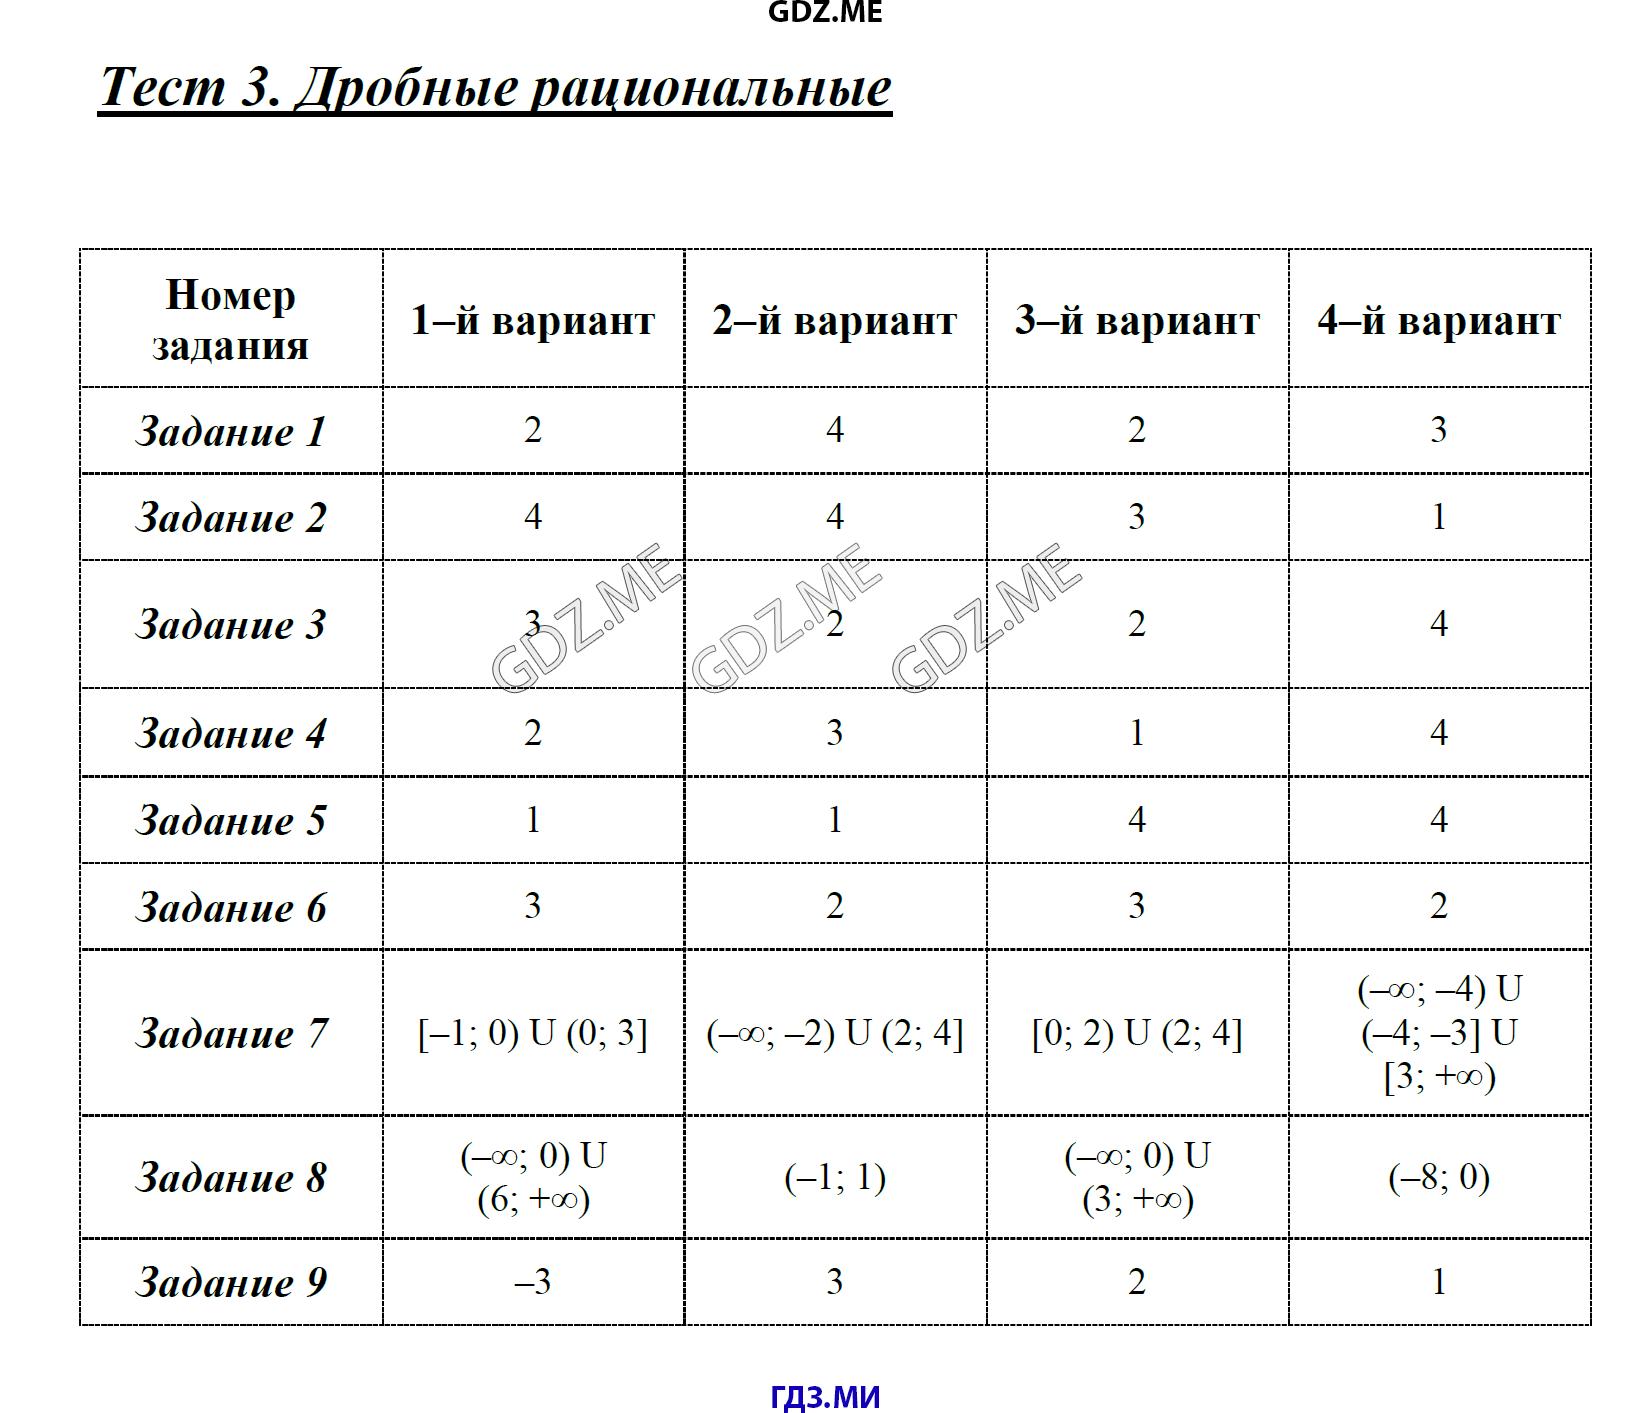 Гдз к тетради по информатики 5 класс коршунова